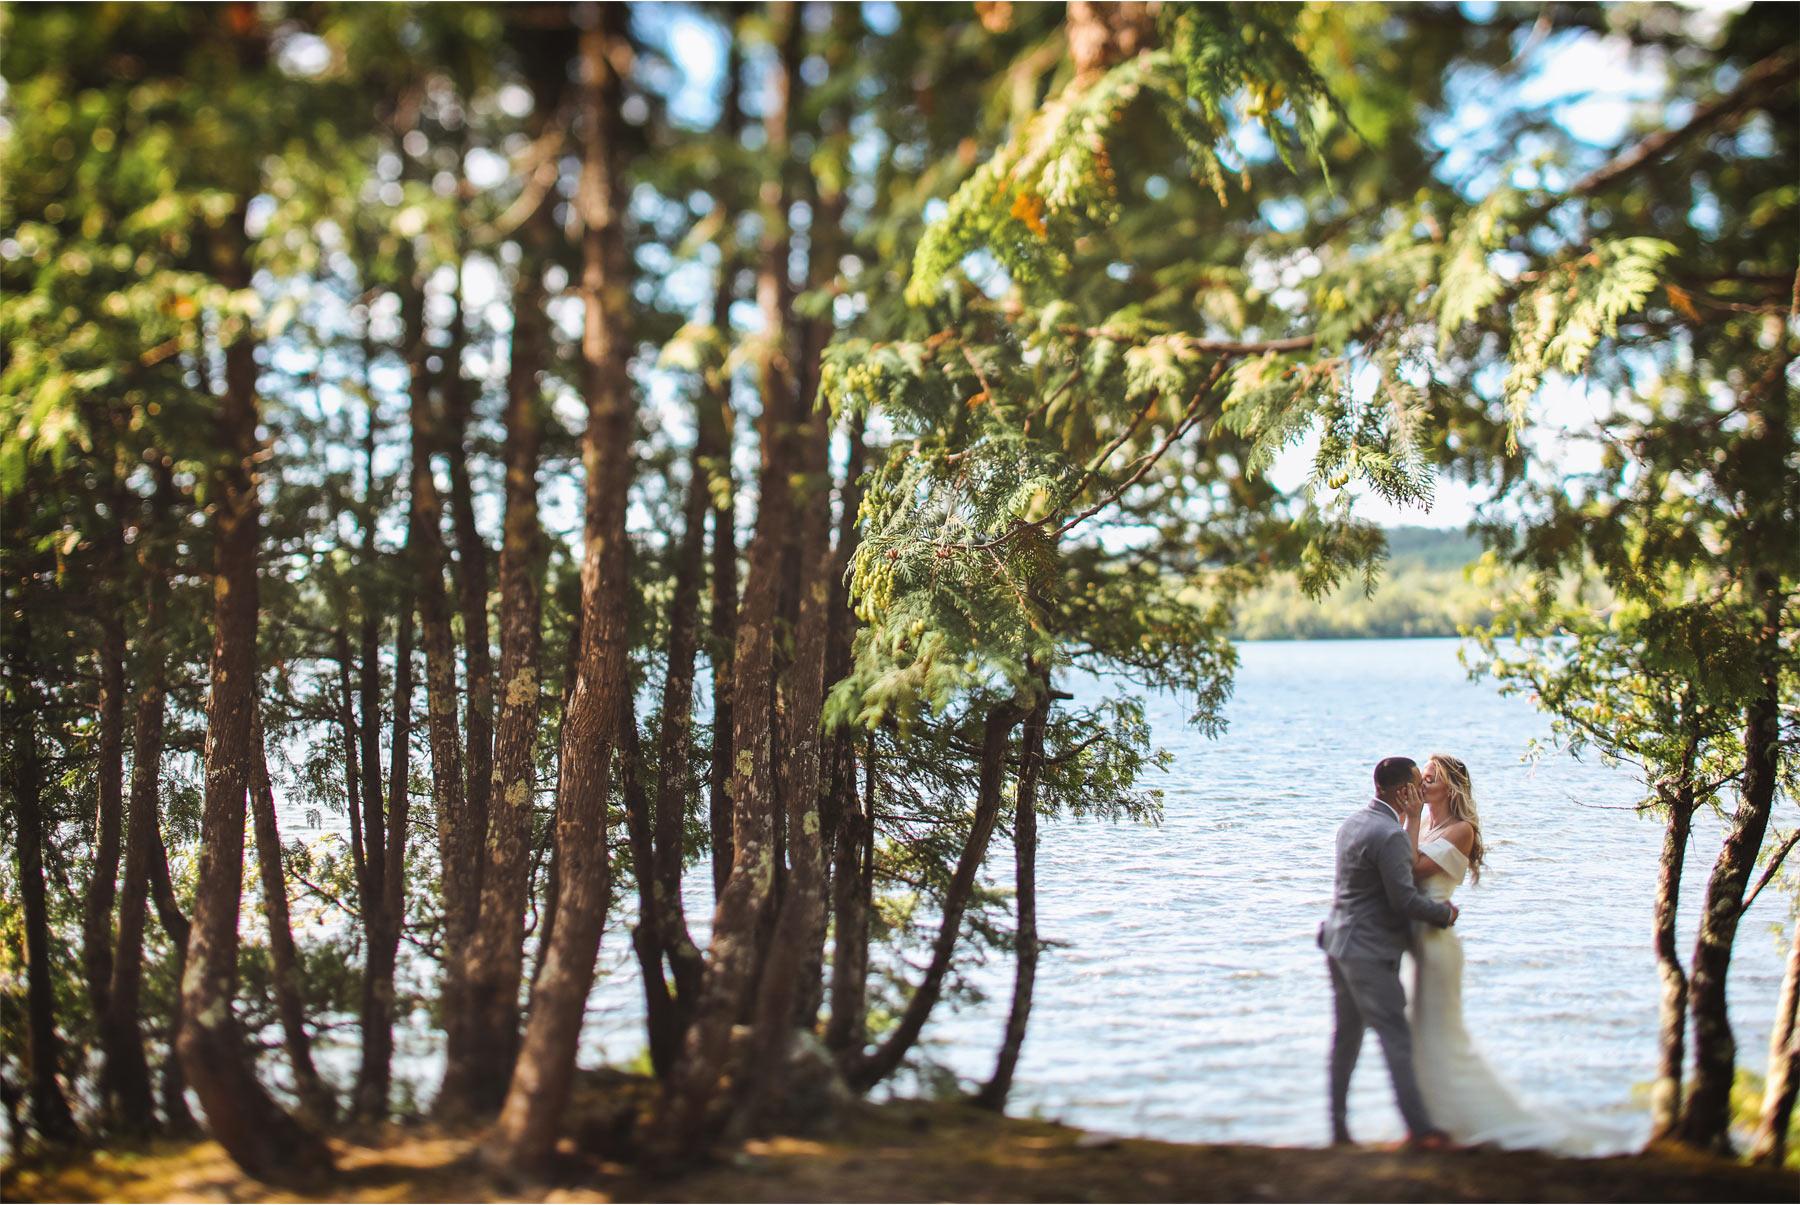 16-Ely-Minnesota-North-Wedding-by-Andrew-Vick-Photography-Lake-Beach-Bride-Groom-Katie-and-Joe.jpg